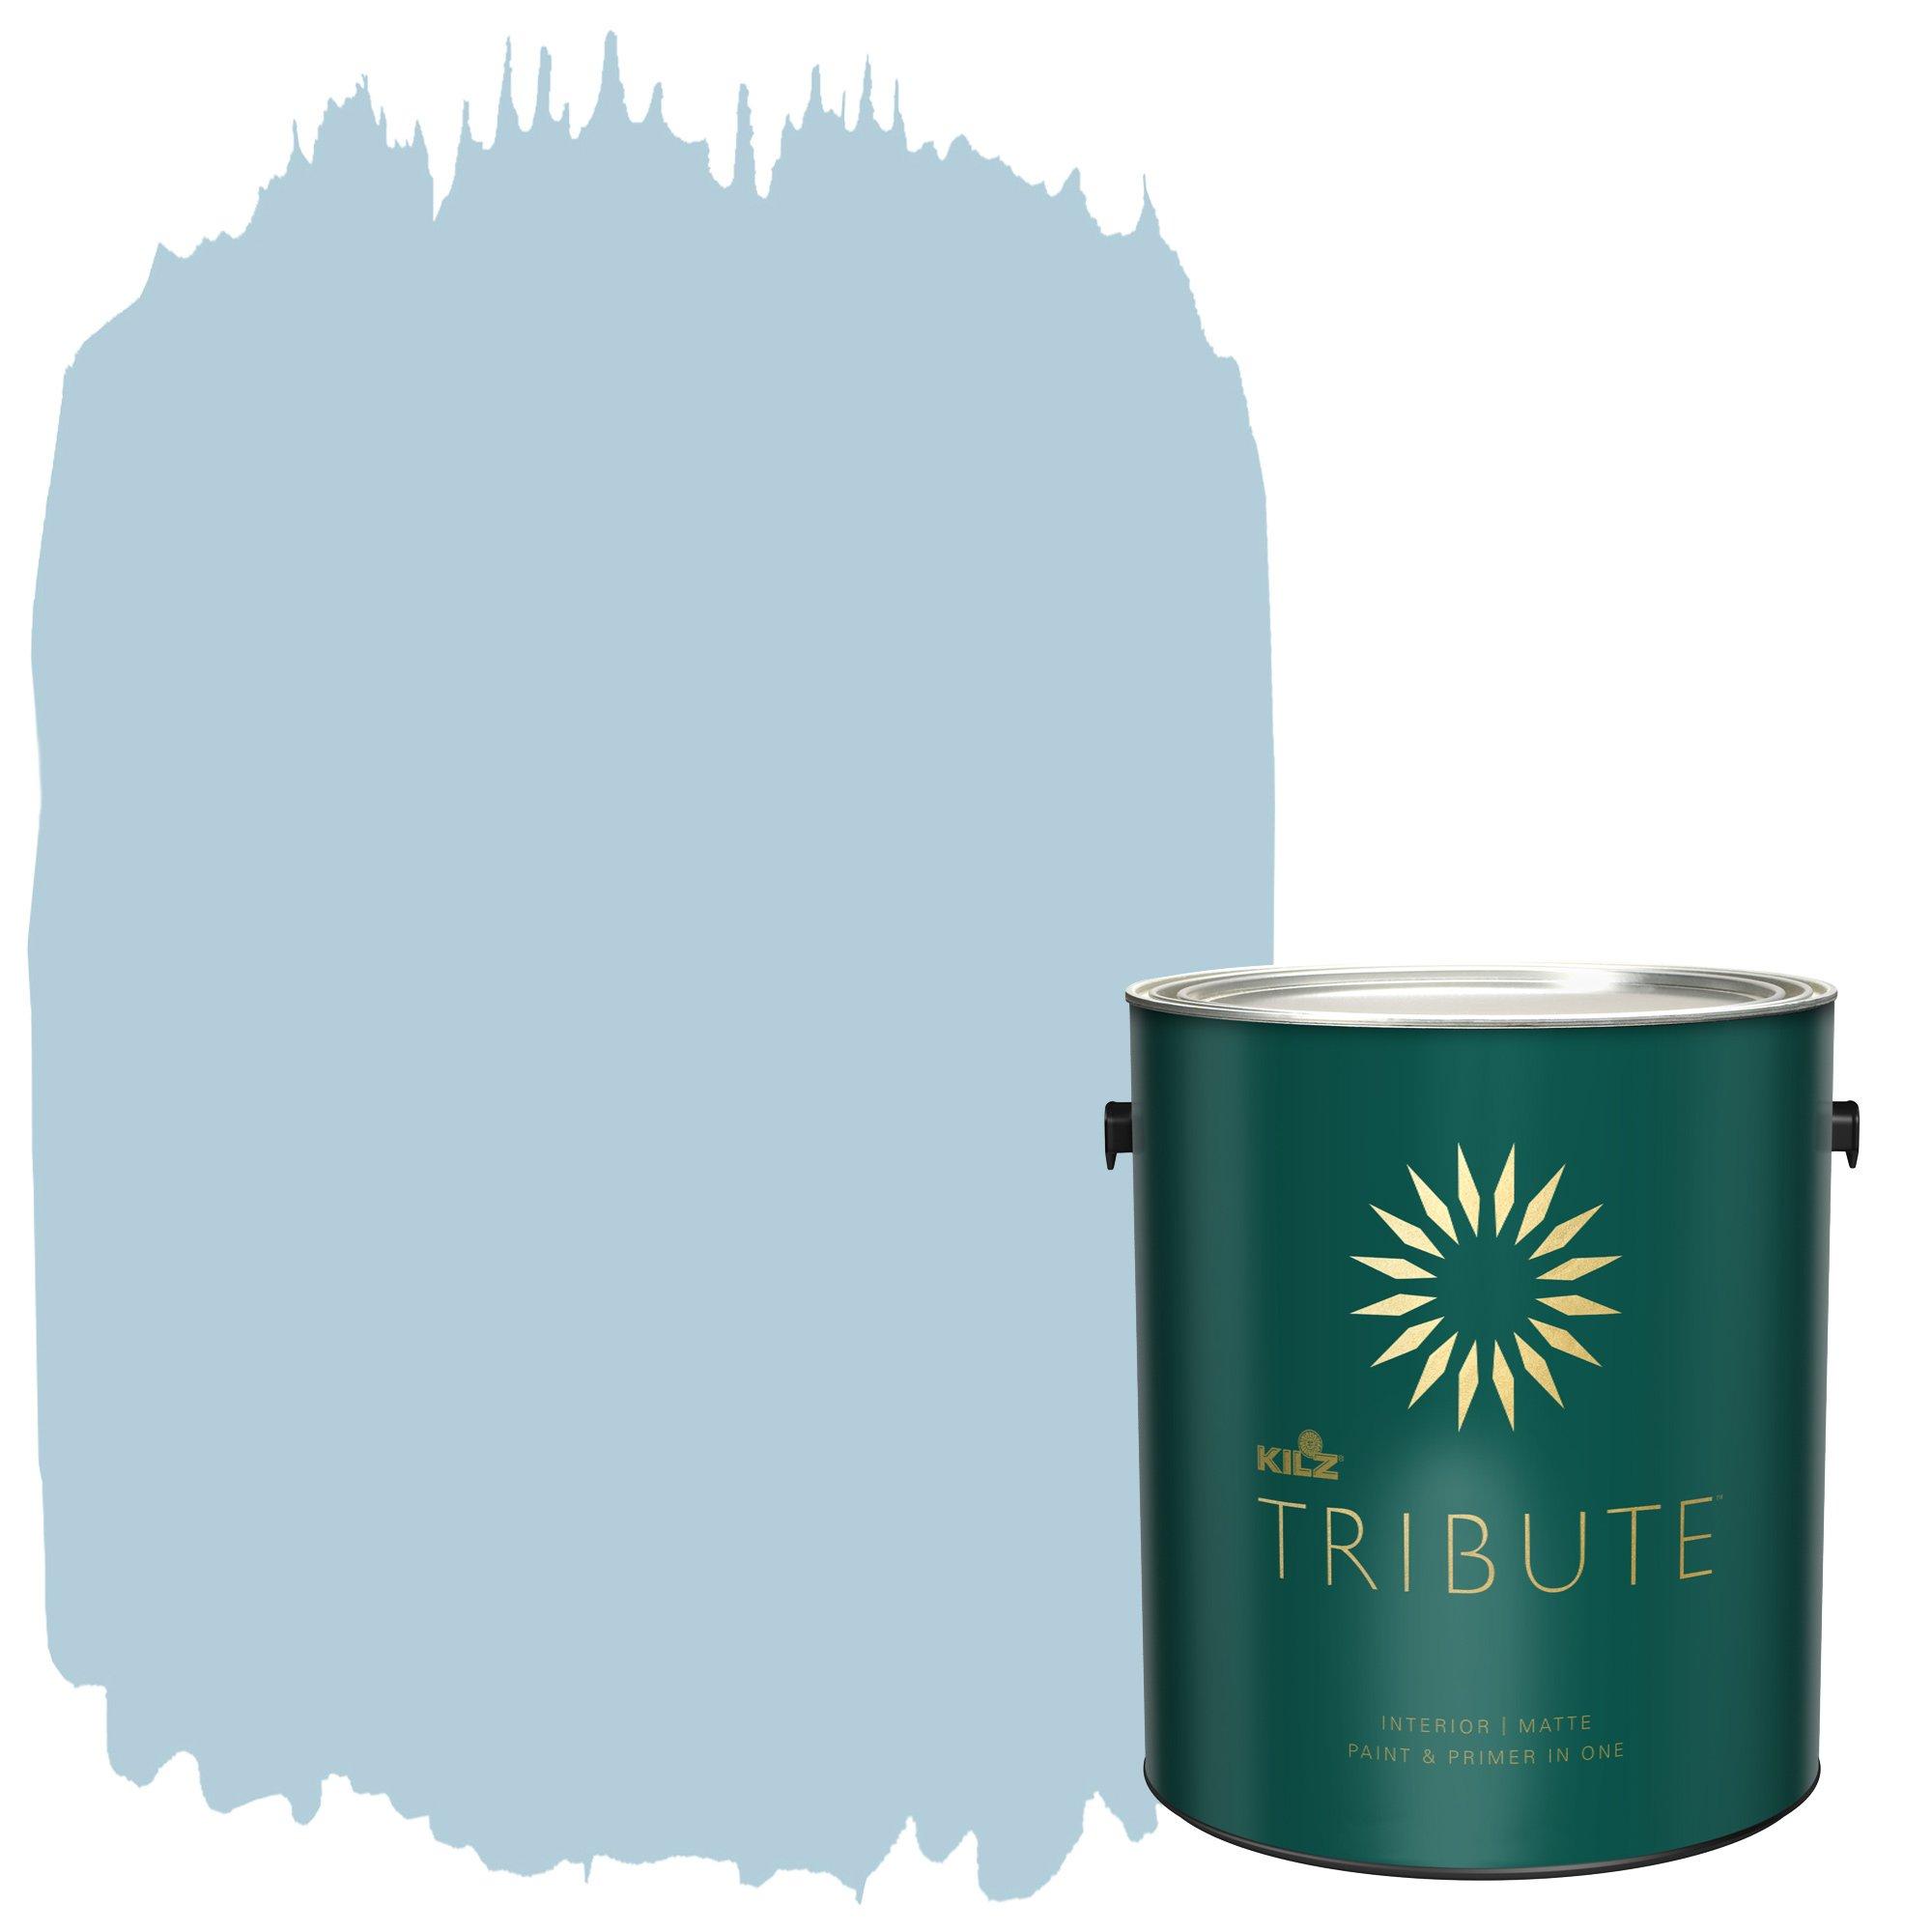 KILZ TRIBUTE Interior Matte Paint and Primer in One, 1 Gallon, Mountain Stream (TB-44)